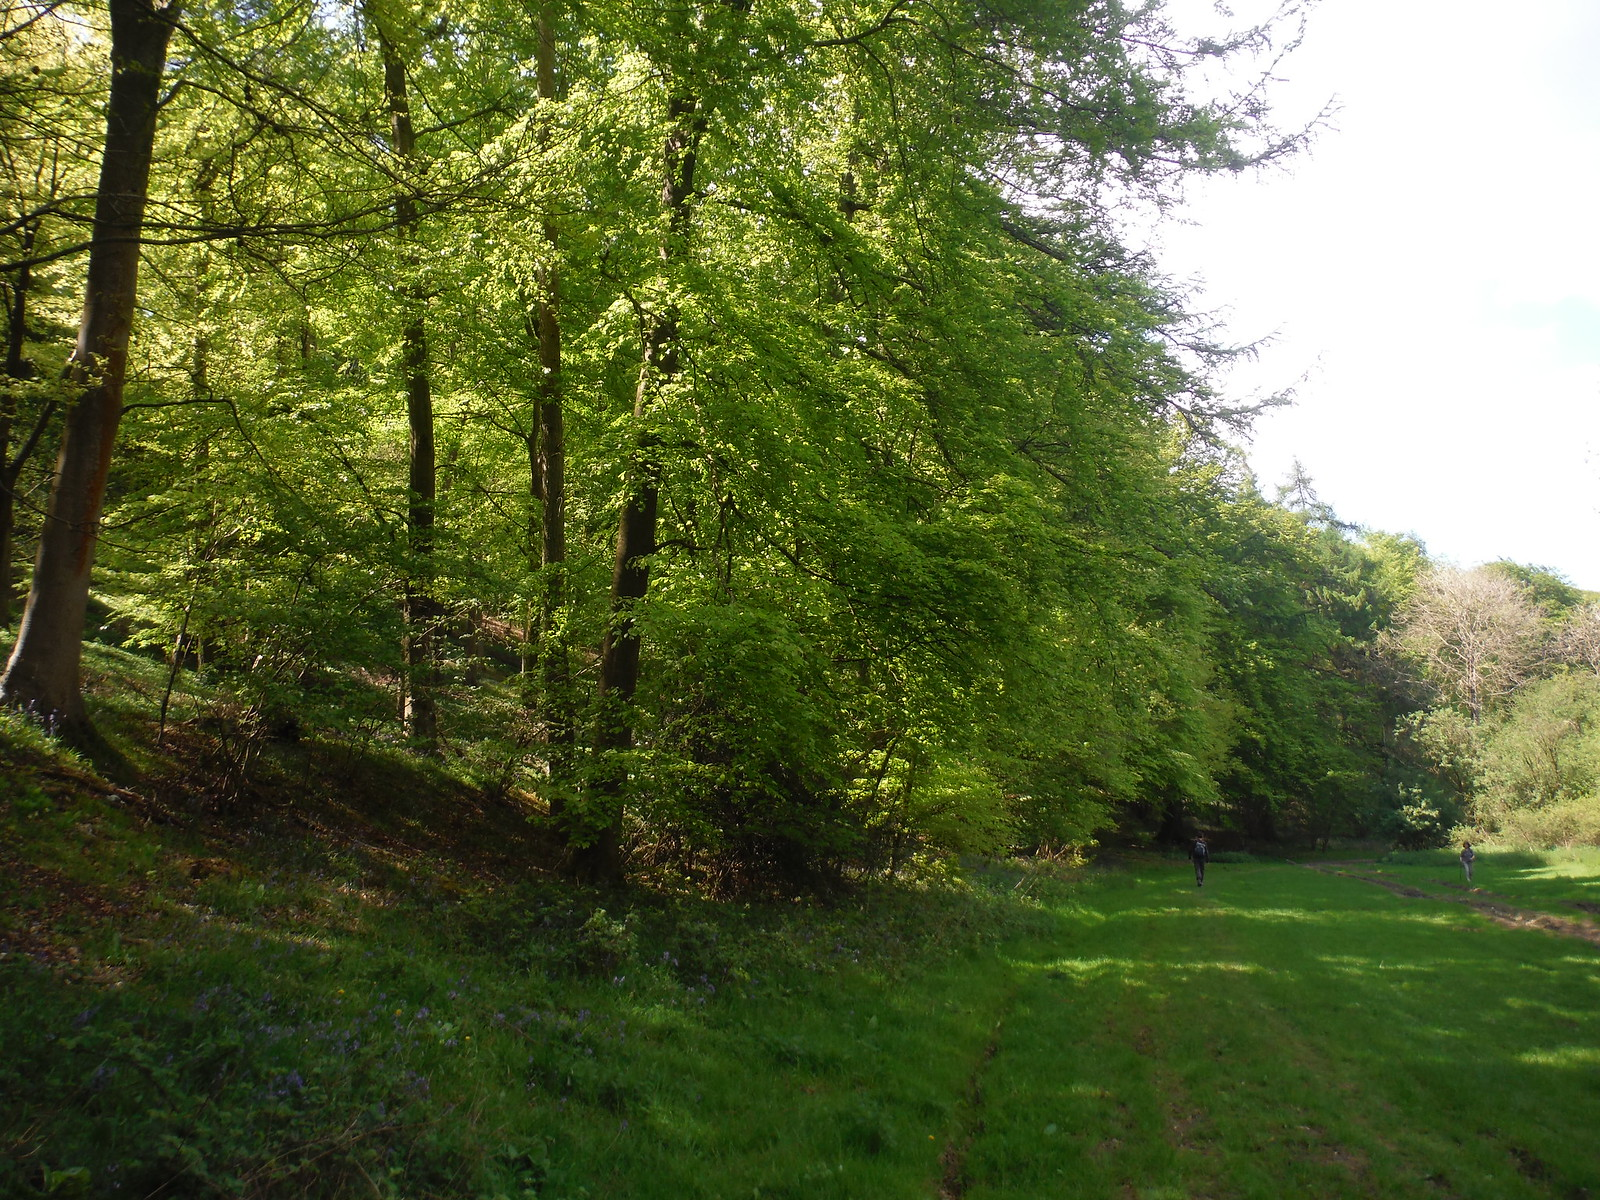 Germanleith Copse SWC Walk Rowlands Castle Circular - Extension